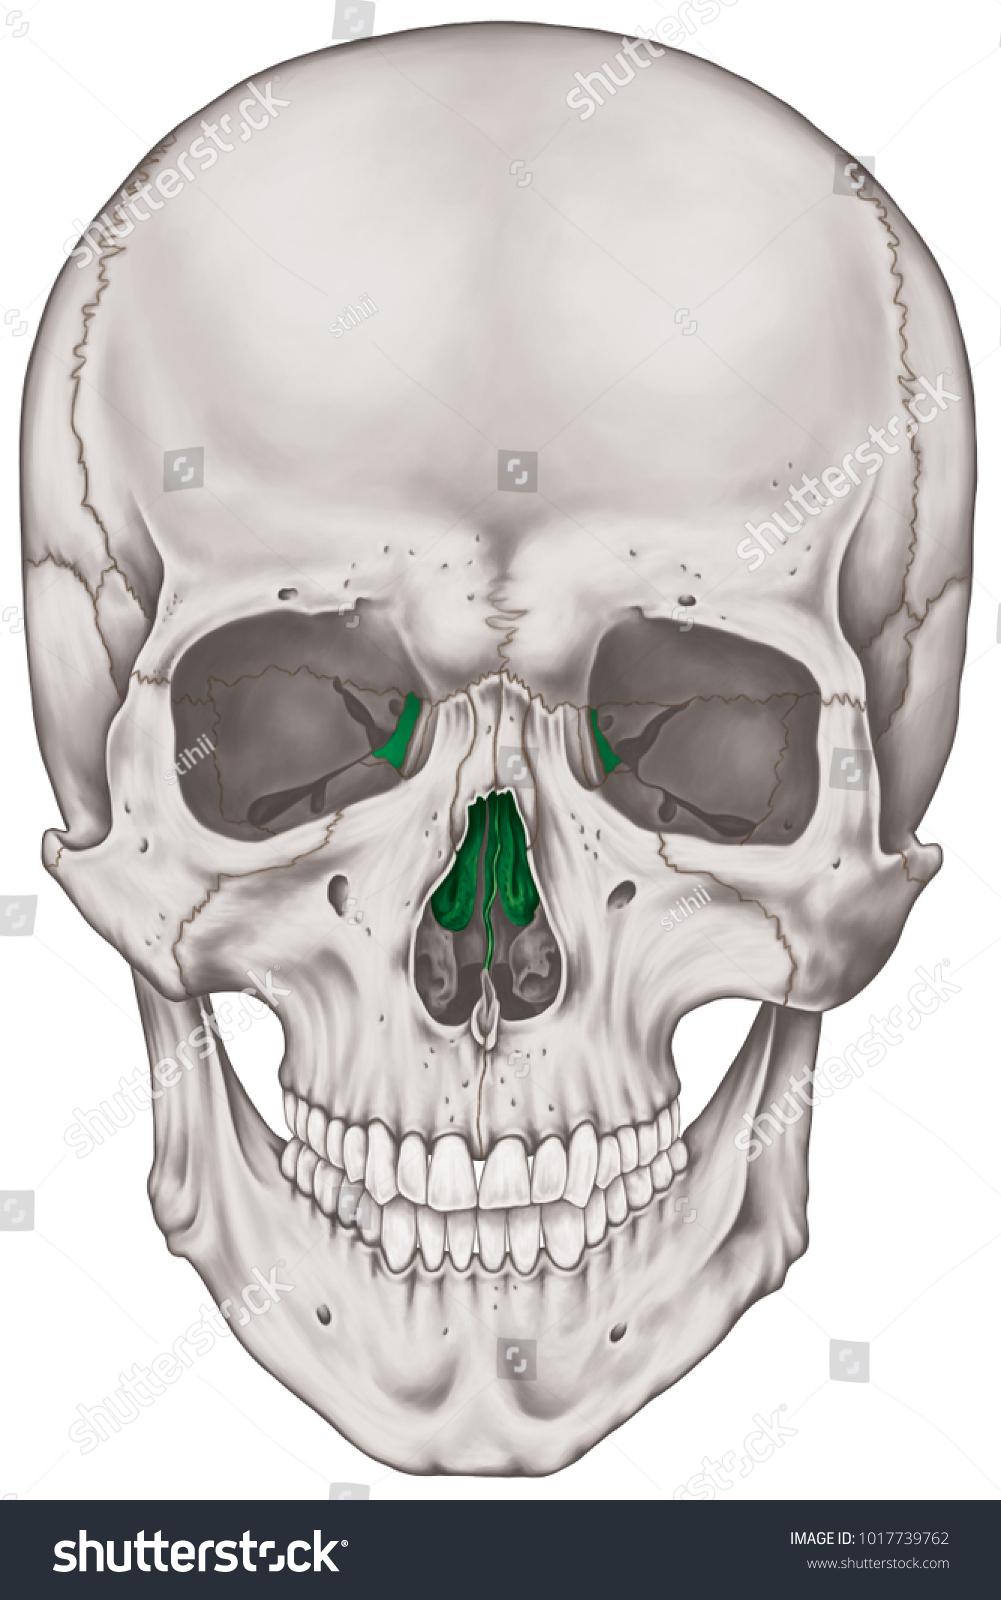 Ethmoid Bone Cranium Bones Head Skull Stock Illustration 1017739762 ...